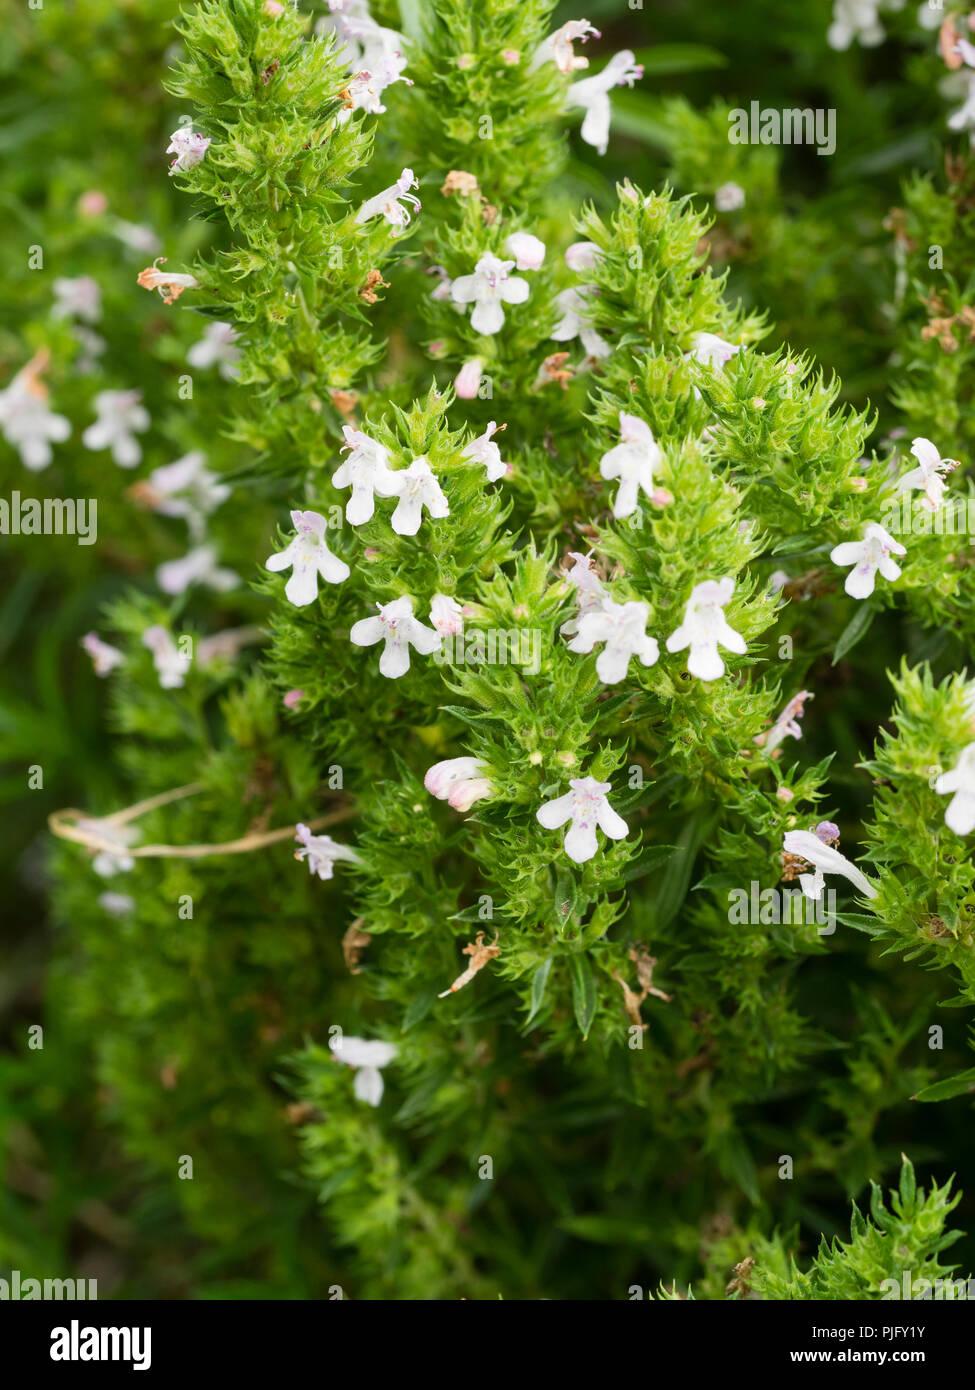 White flowers among the semi evergreen growth of the perennial winter savory herb, Satureja montana Stock Photo